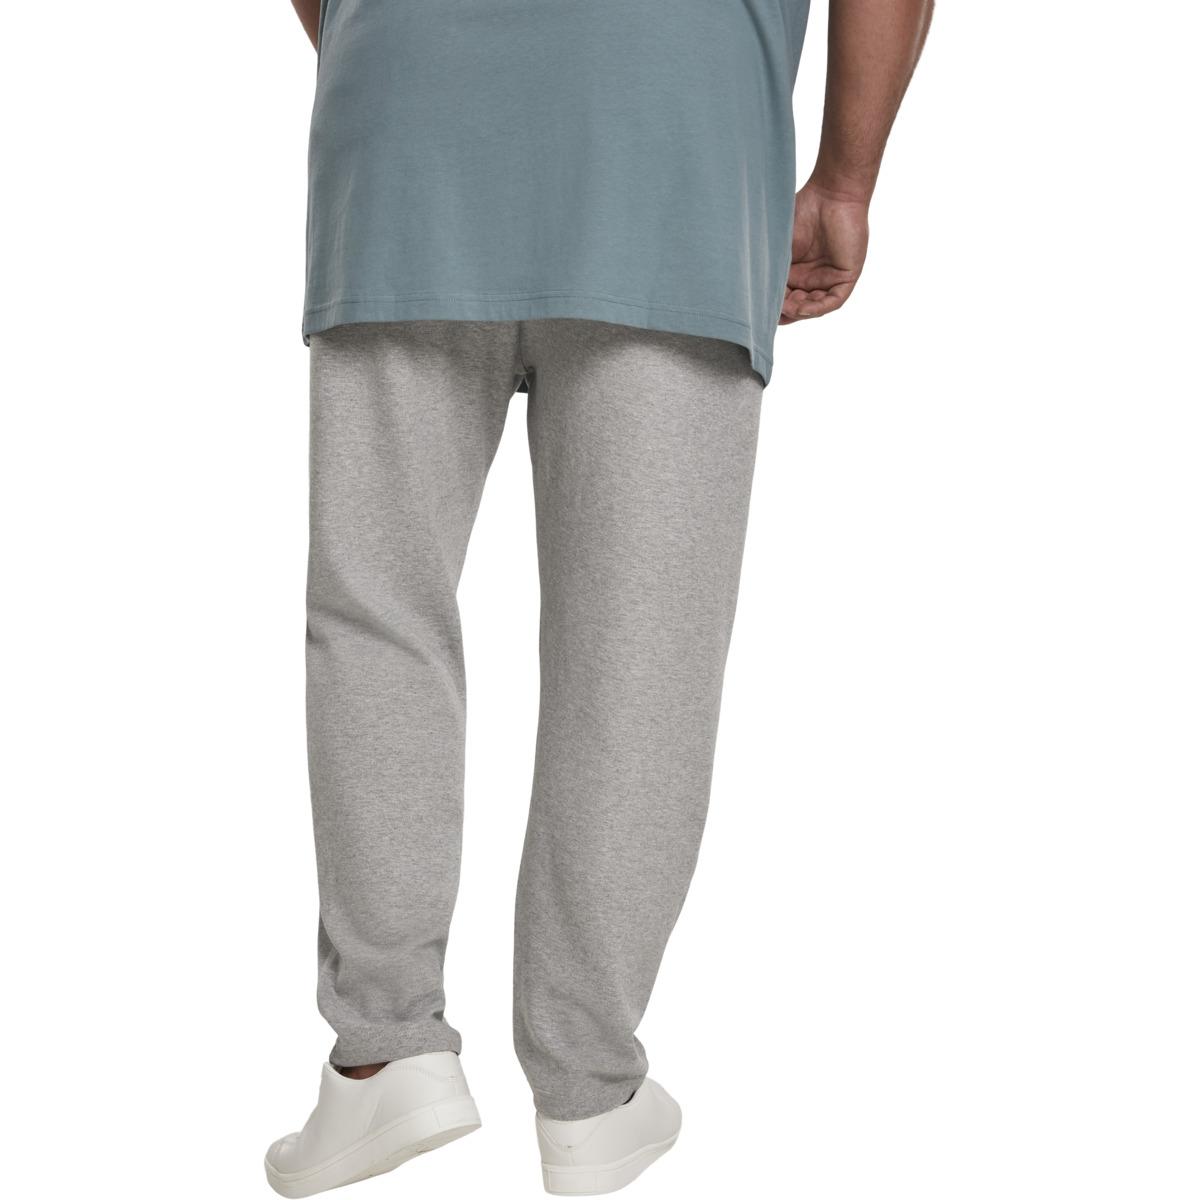 Urban Classics Formula Cropped Peached Interlock Pants Jogginghose Herren S 5XL